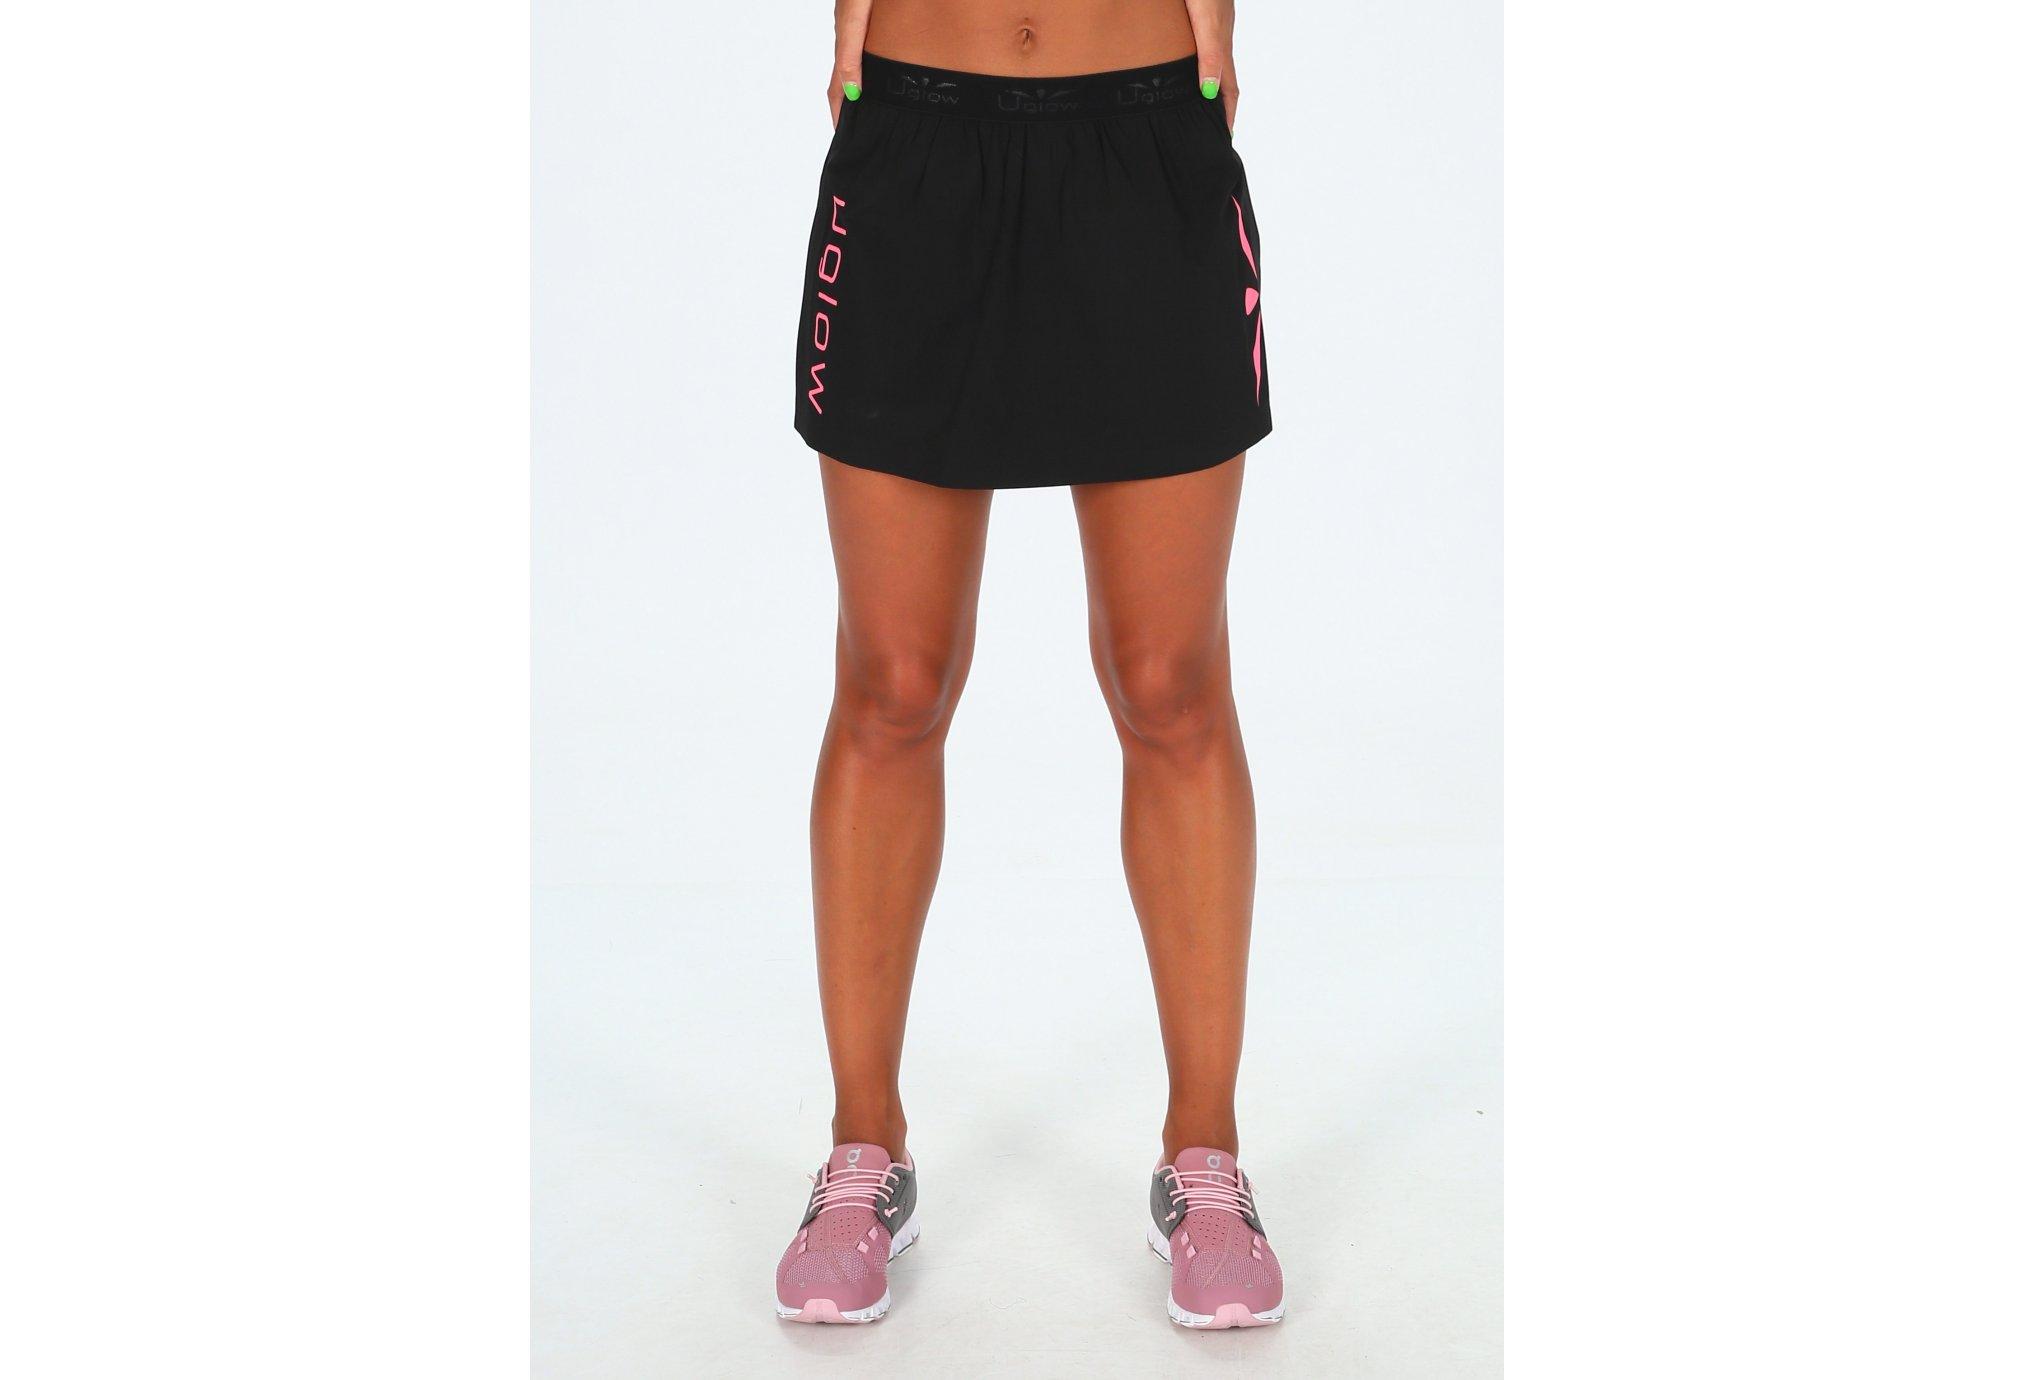 Uglow Skirt Ultra W Diététique Vêtements femme